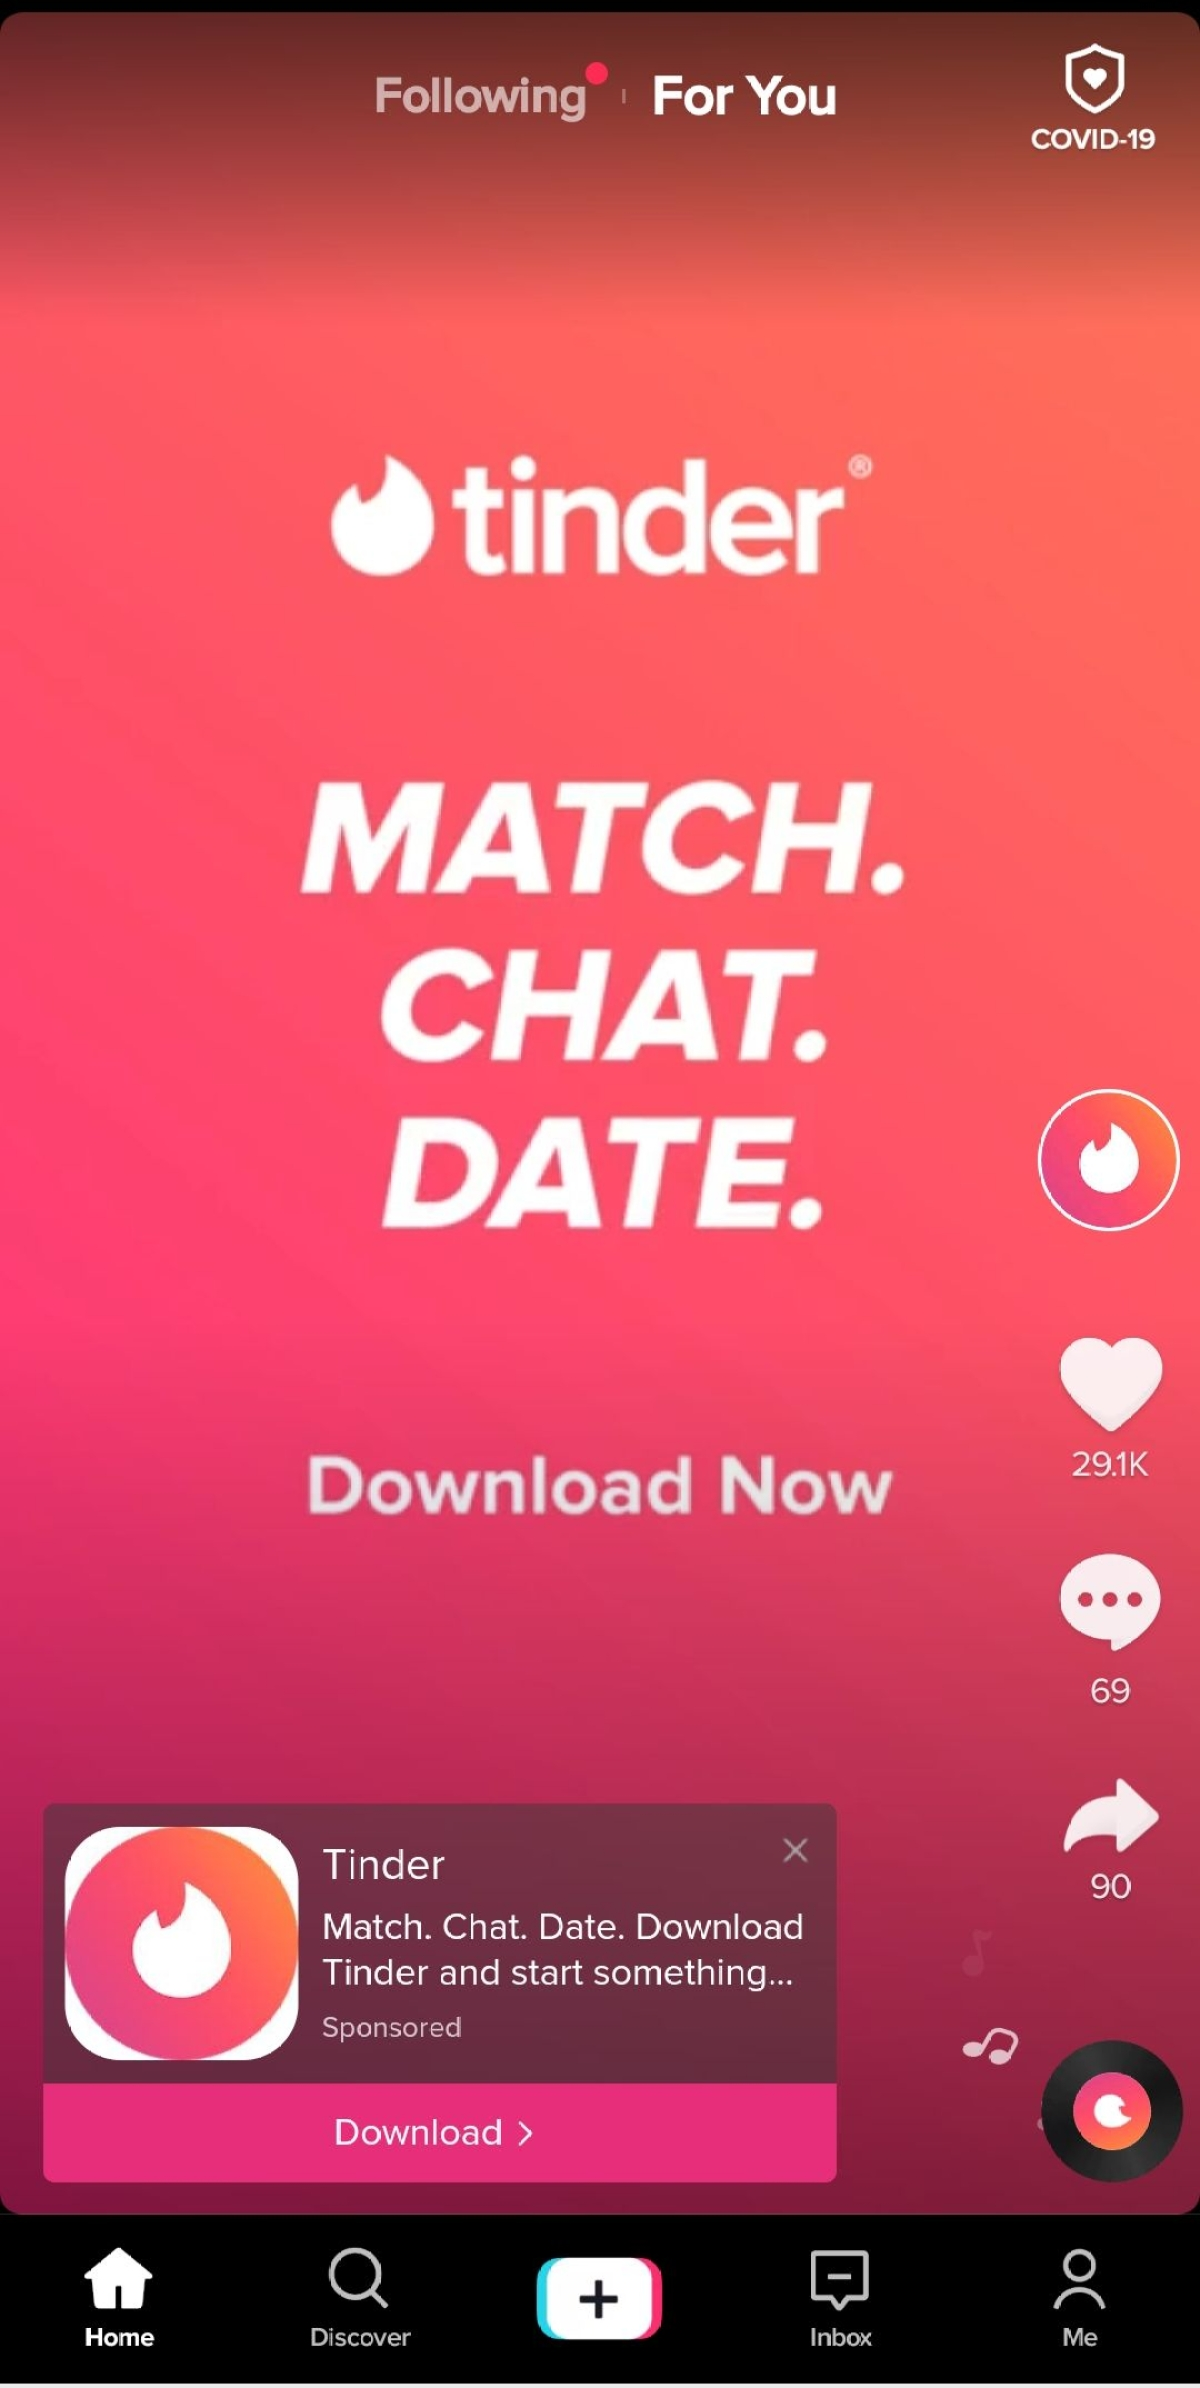 Facebook, Instagram, Tinder display ads on TikTok